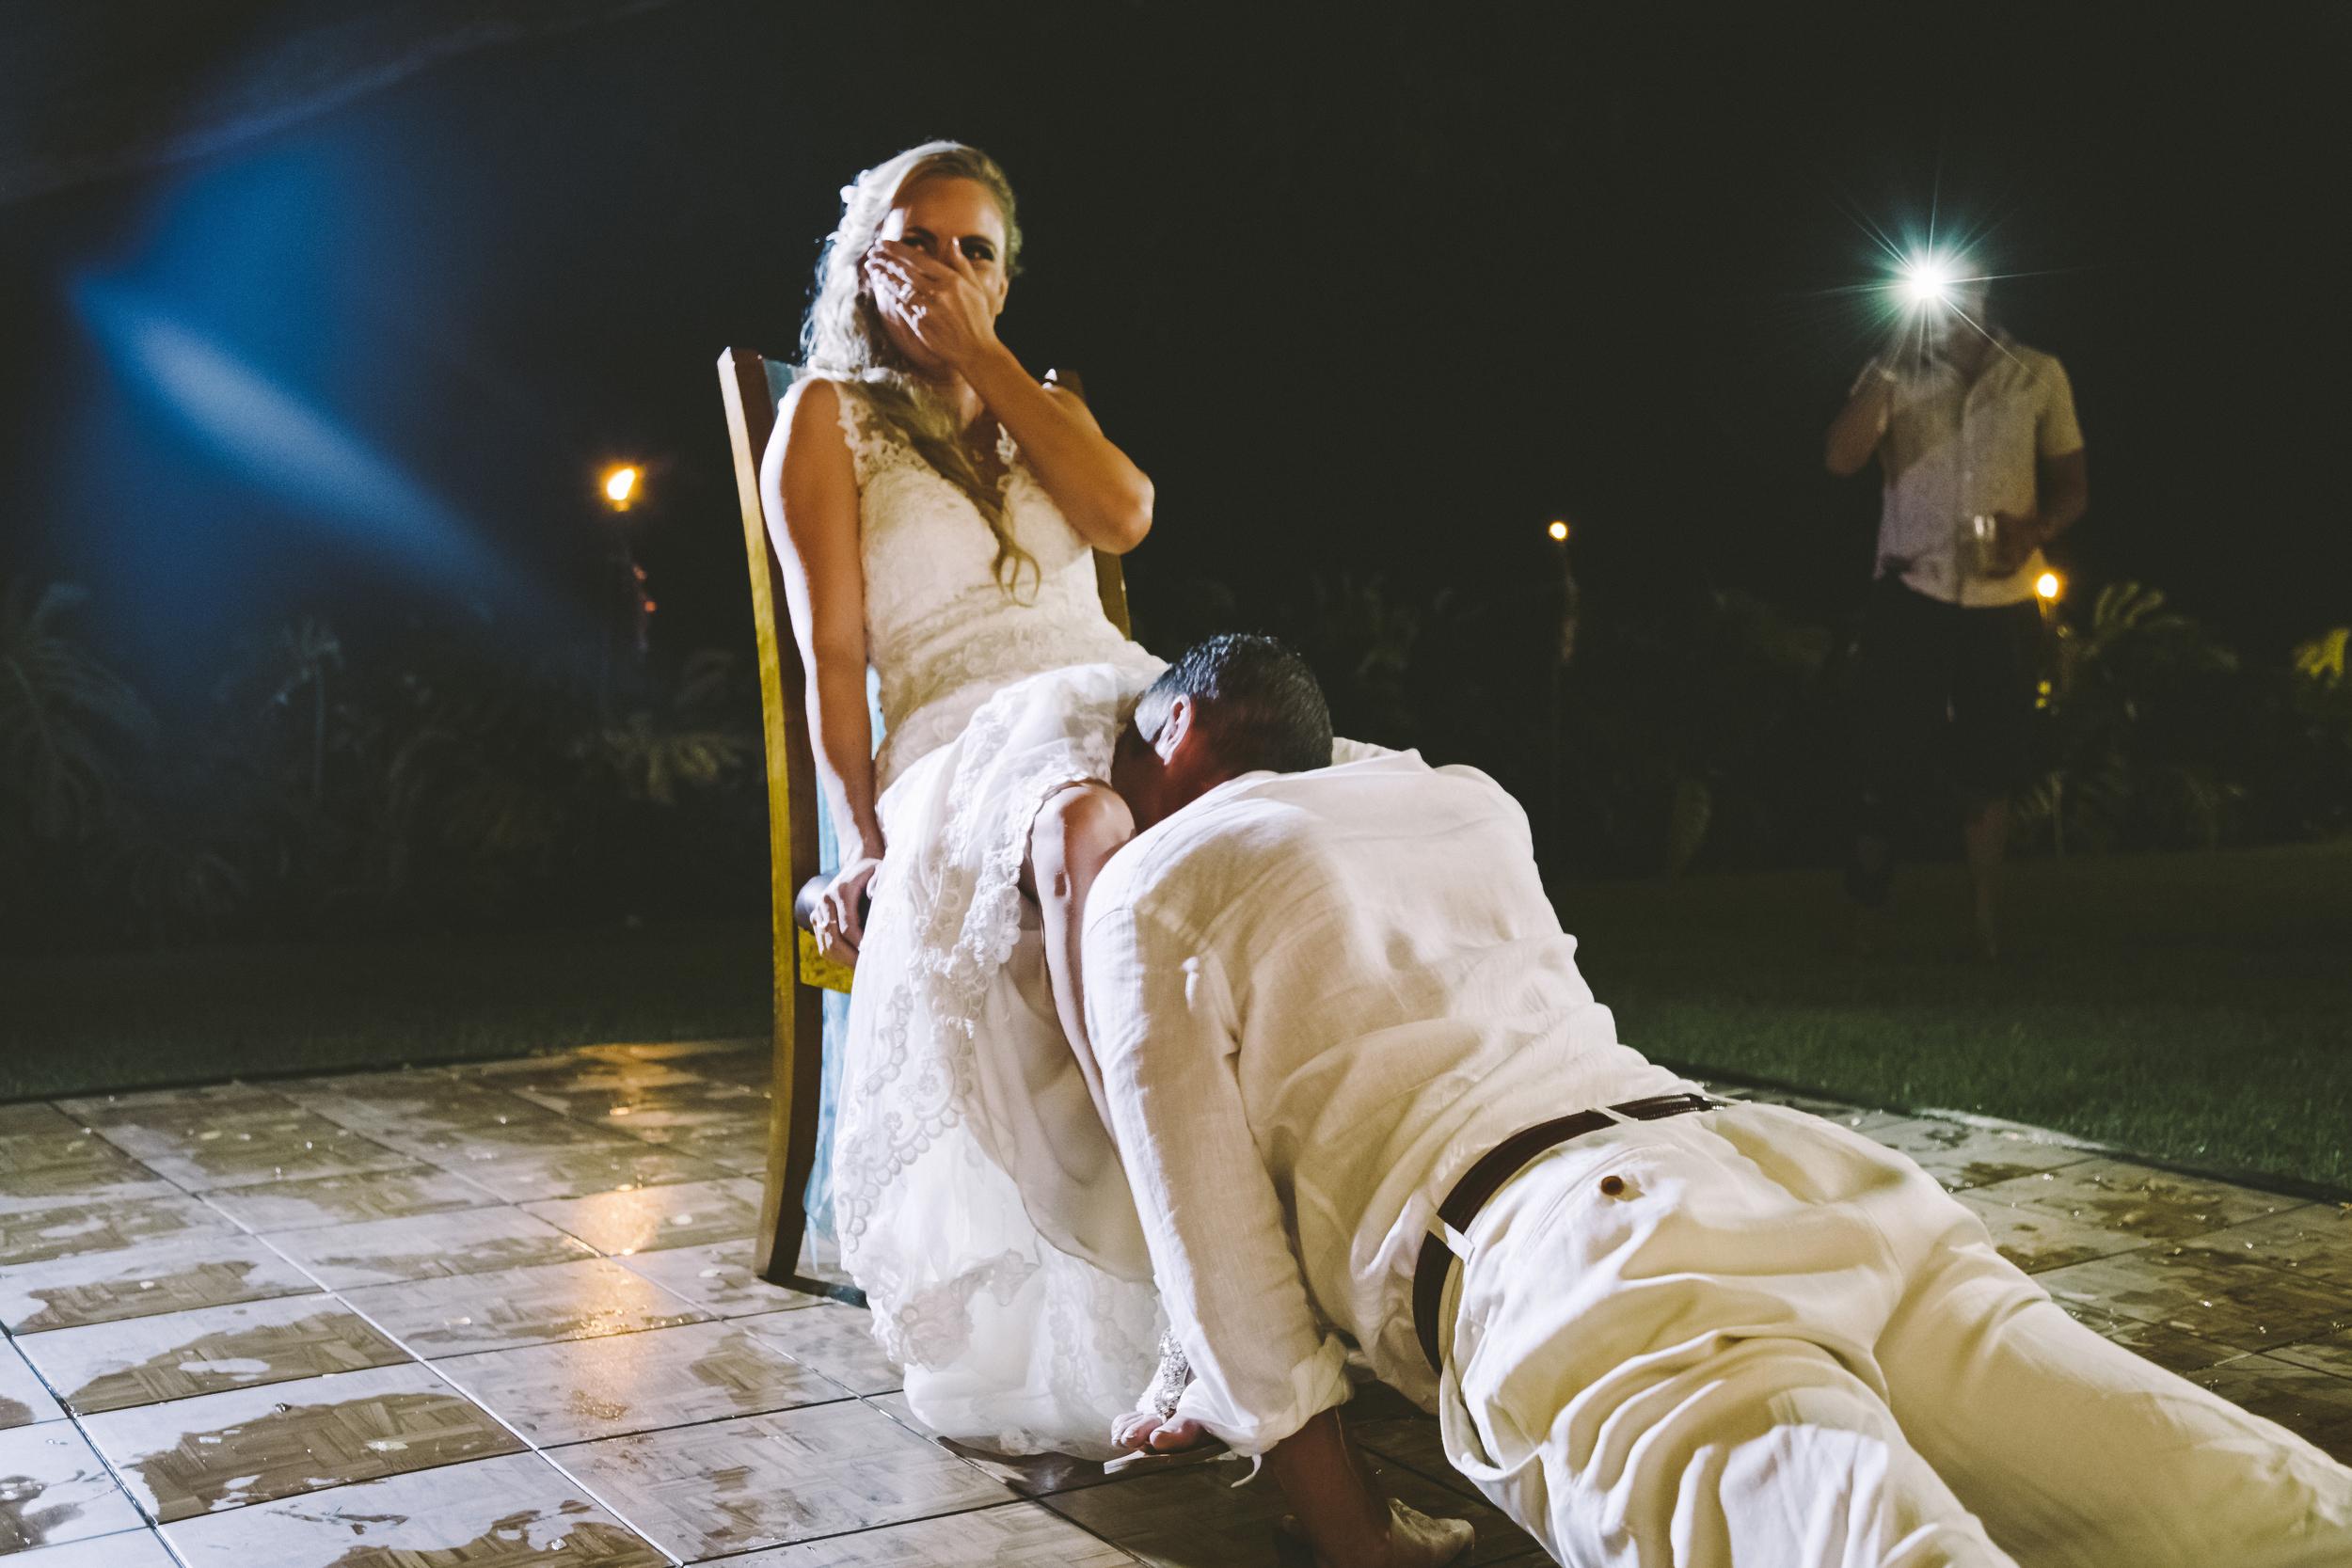 angie-diaz-photography-hawaii-wedding-photographer-kelli-jay-133.jpg